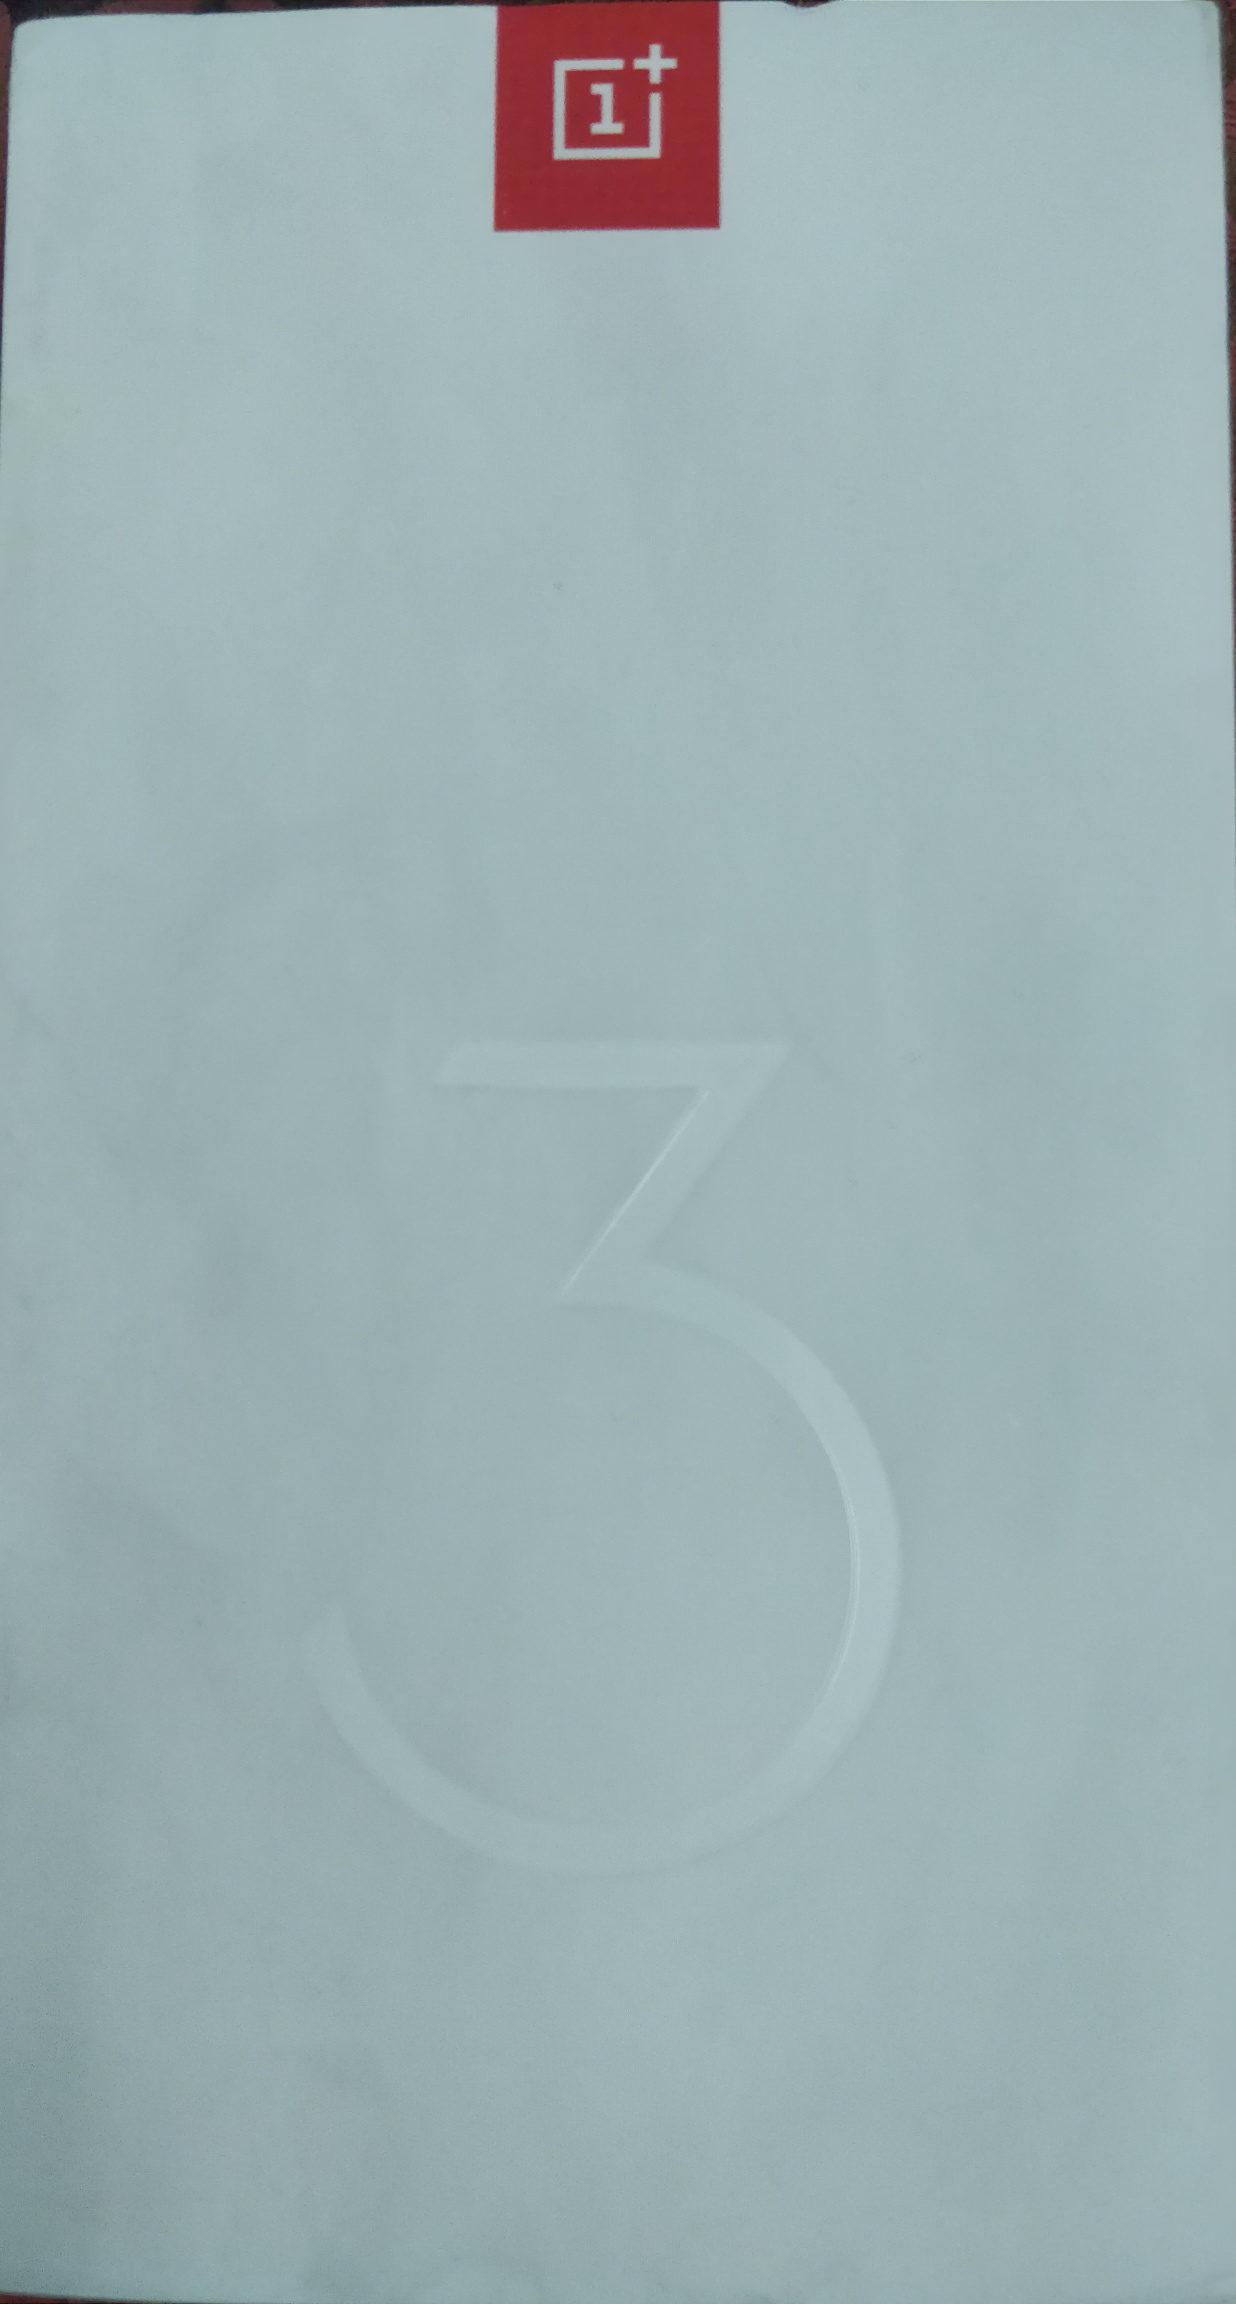 OnePlus 3T - Product - en